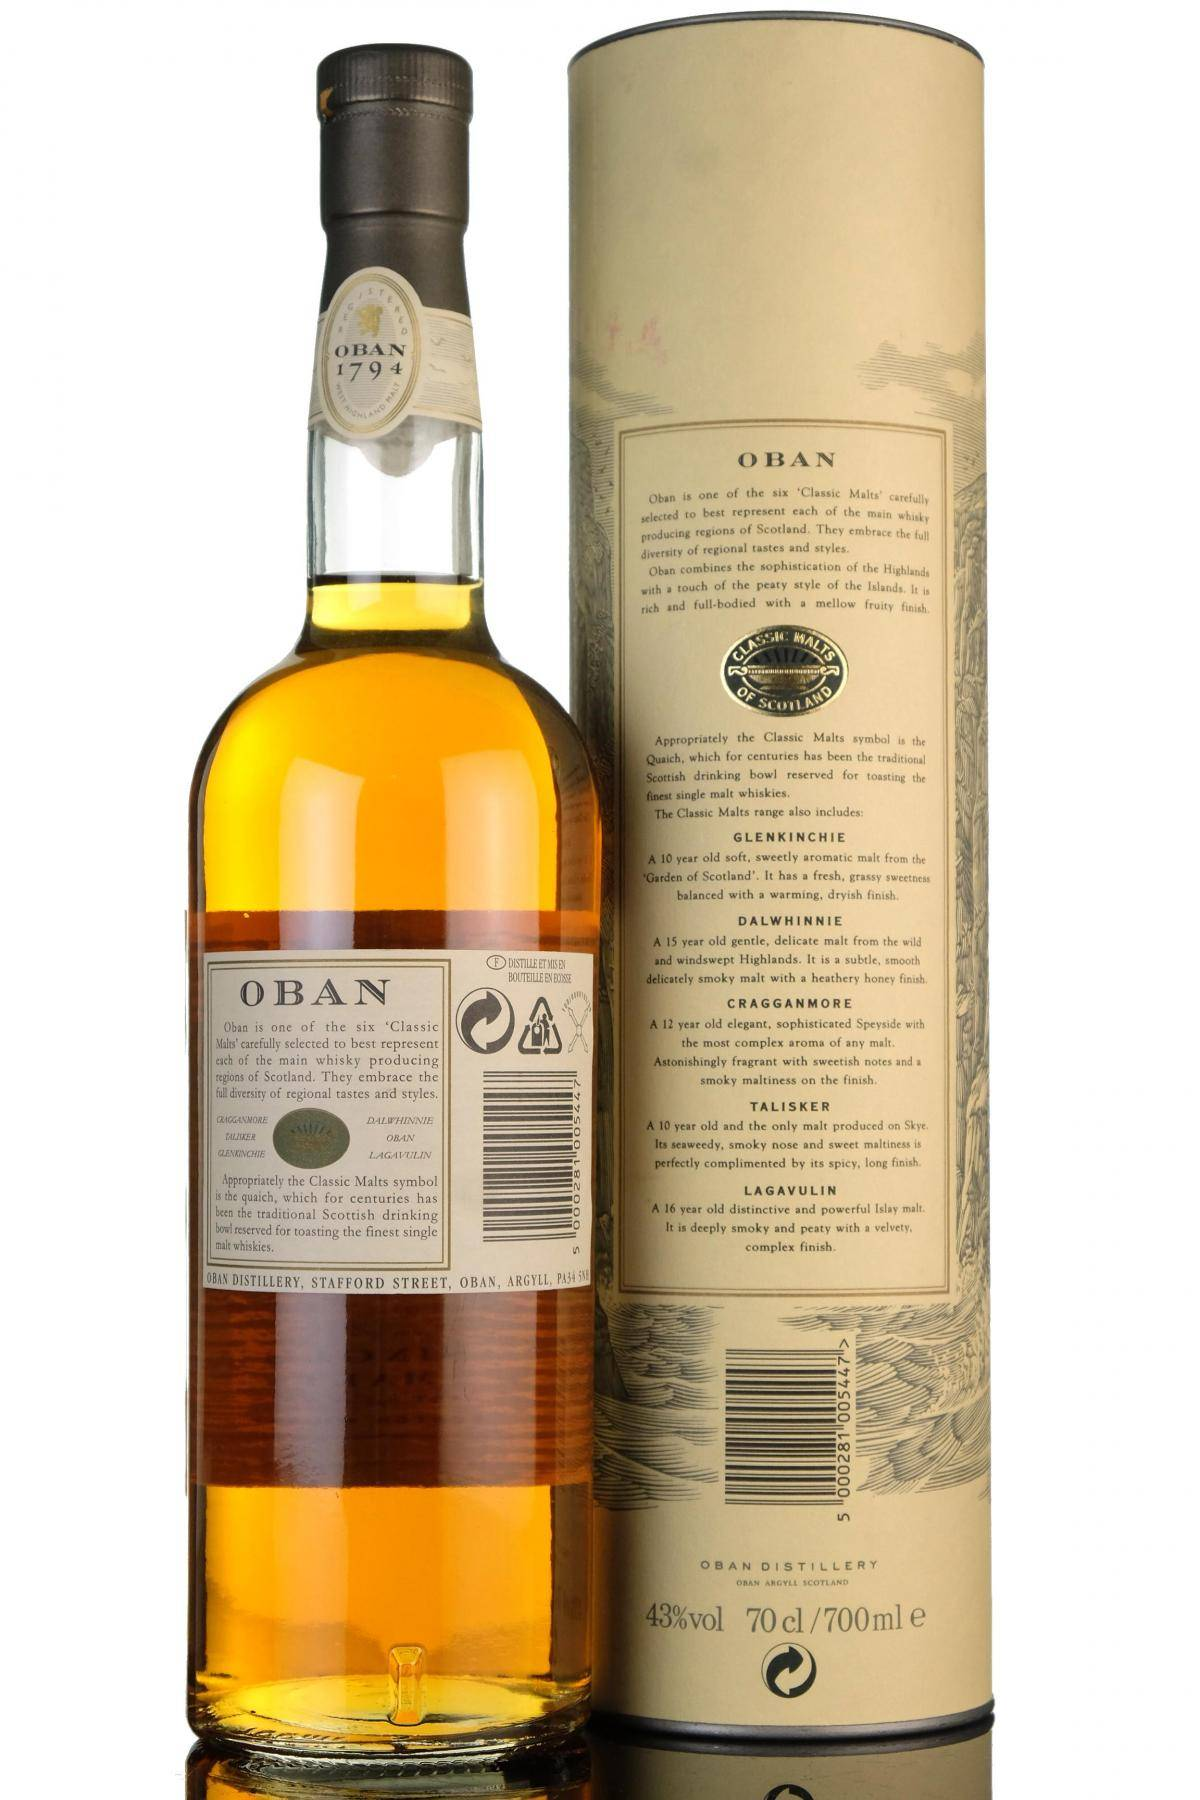 Виски oban (обан): описание, виды, история марки